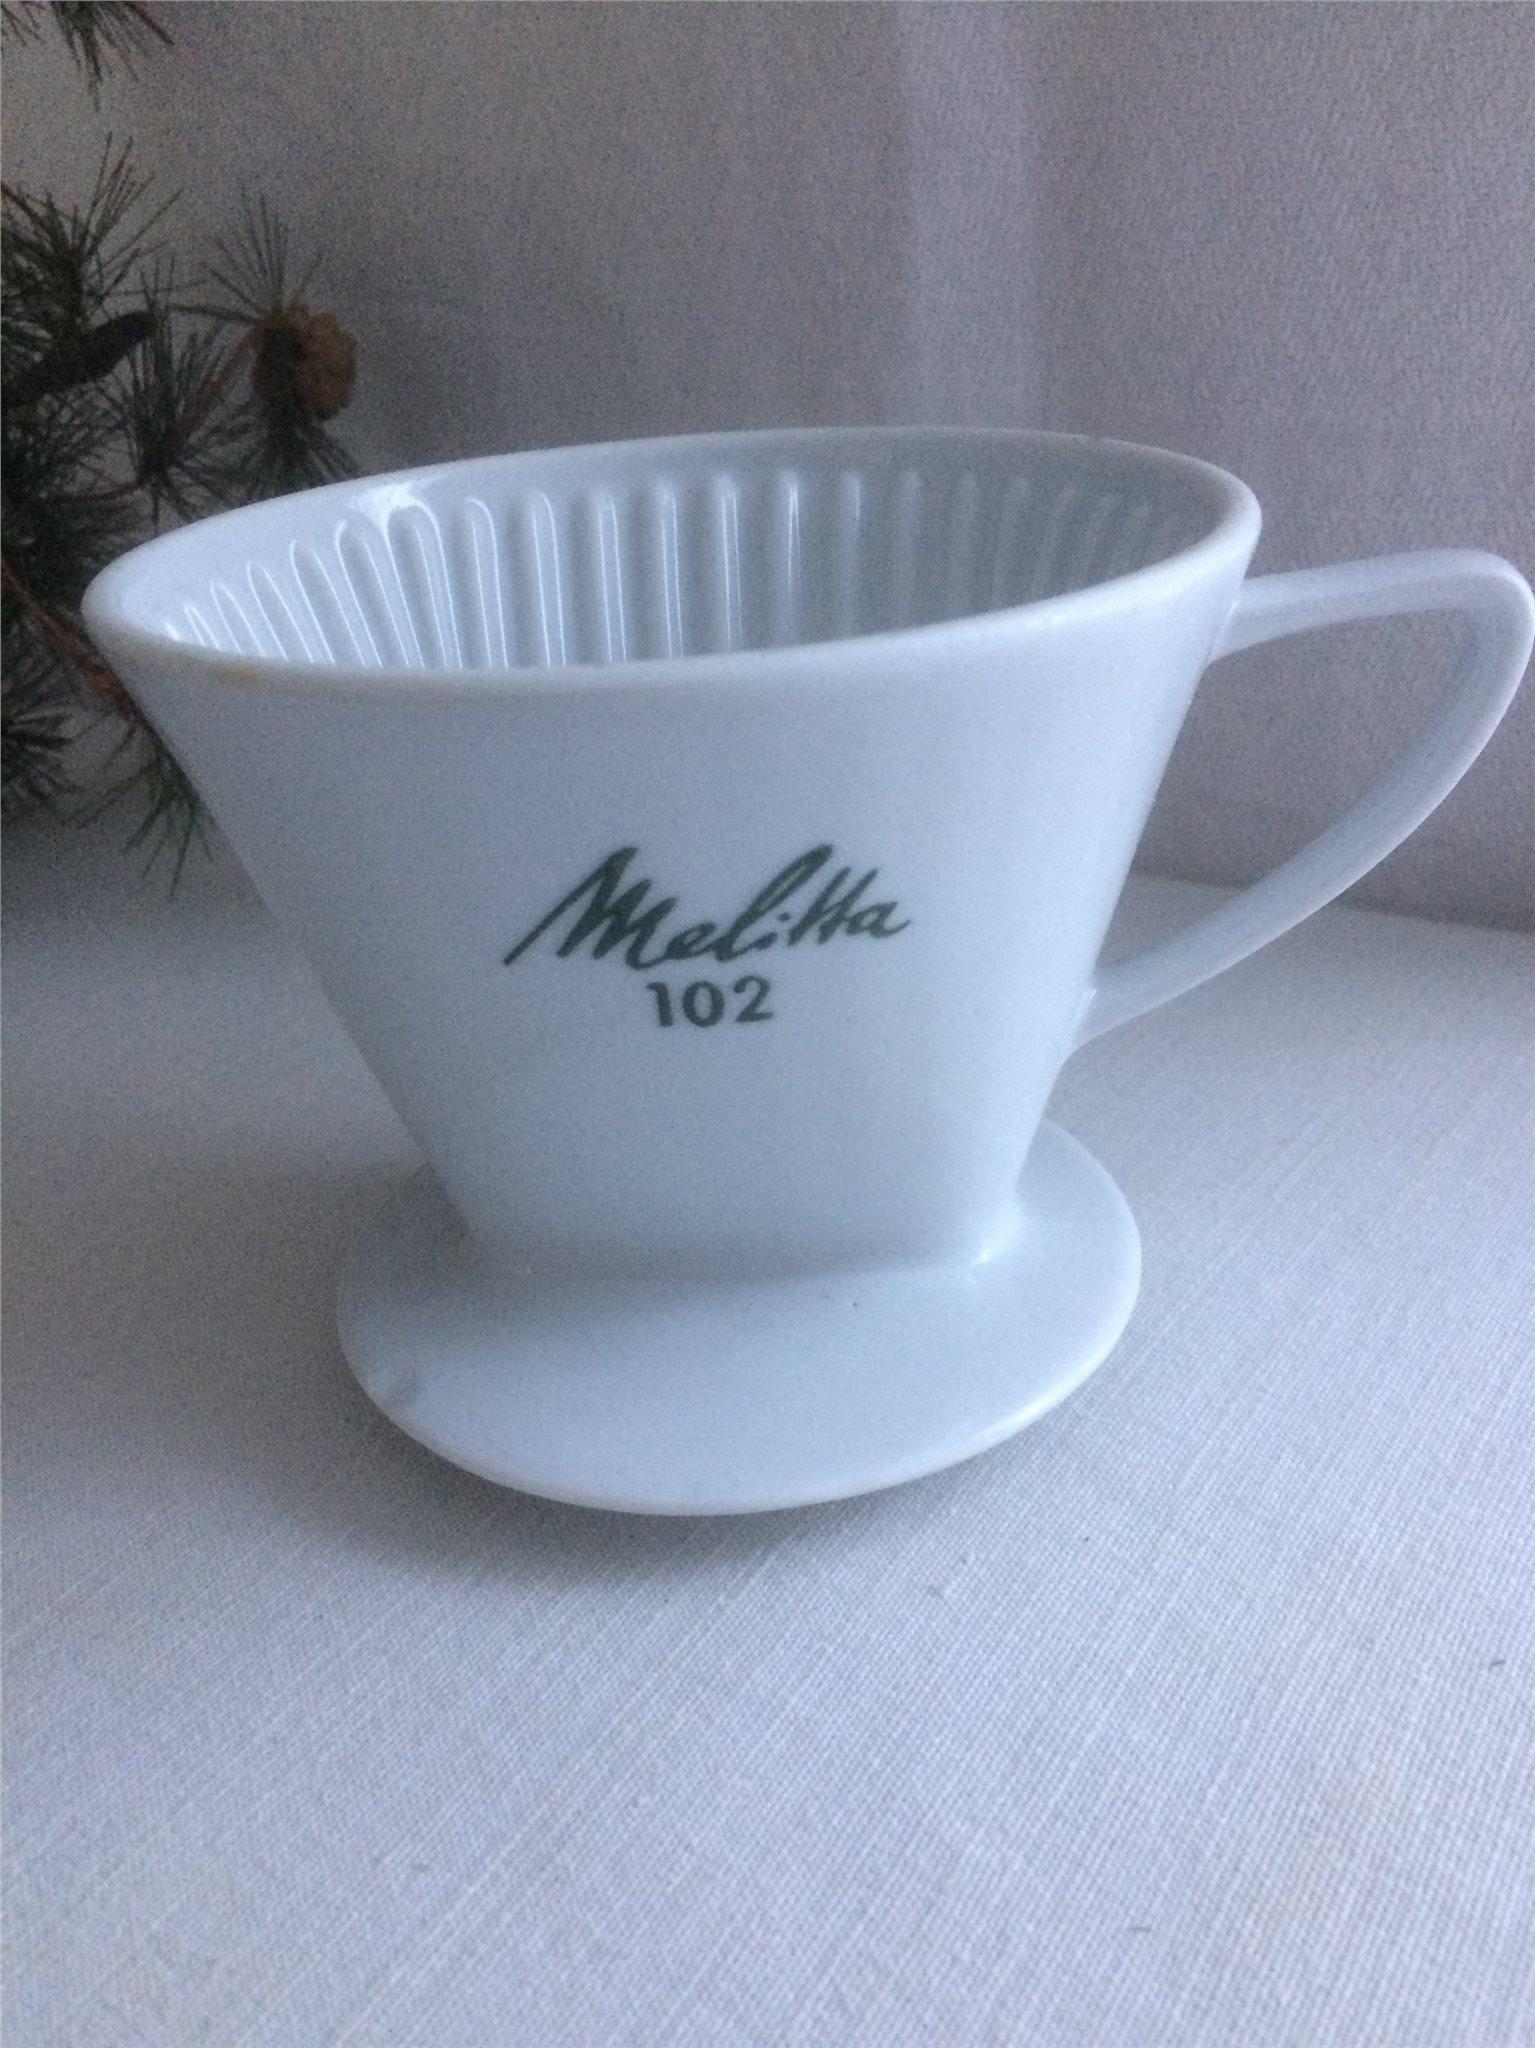 melitta filterhållare 102